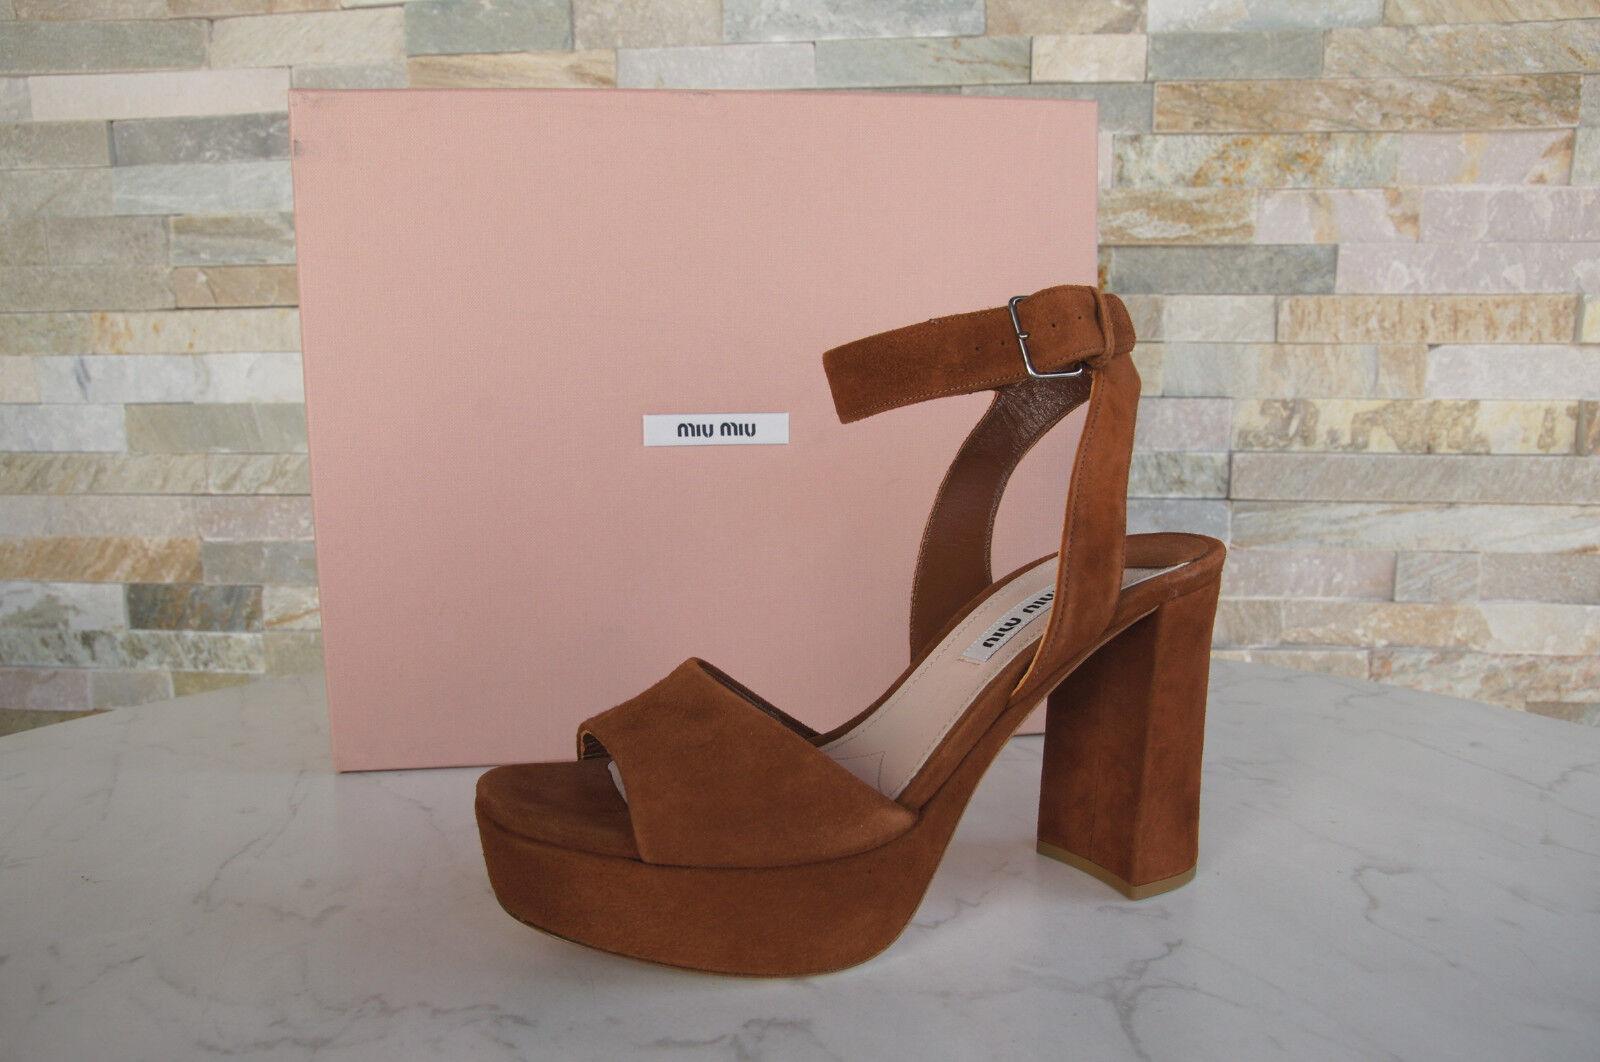 MIU MIU Size 40 Platform Sandals shoes Brown pinkwood NEW formerly